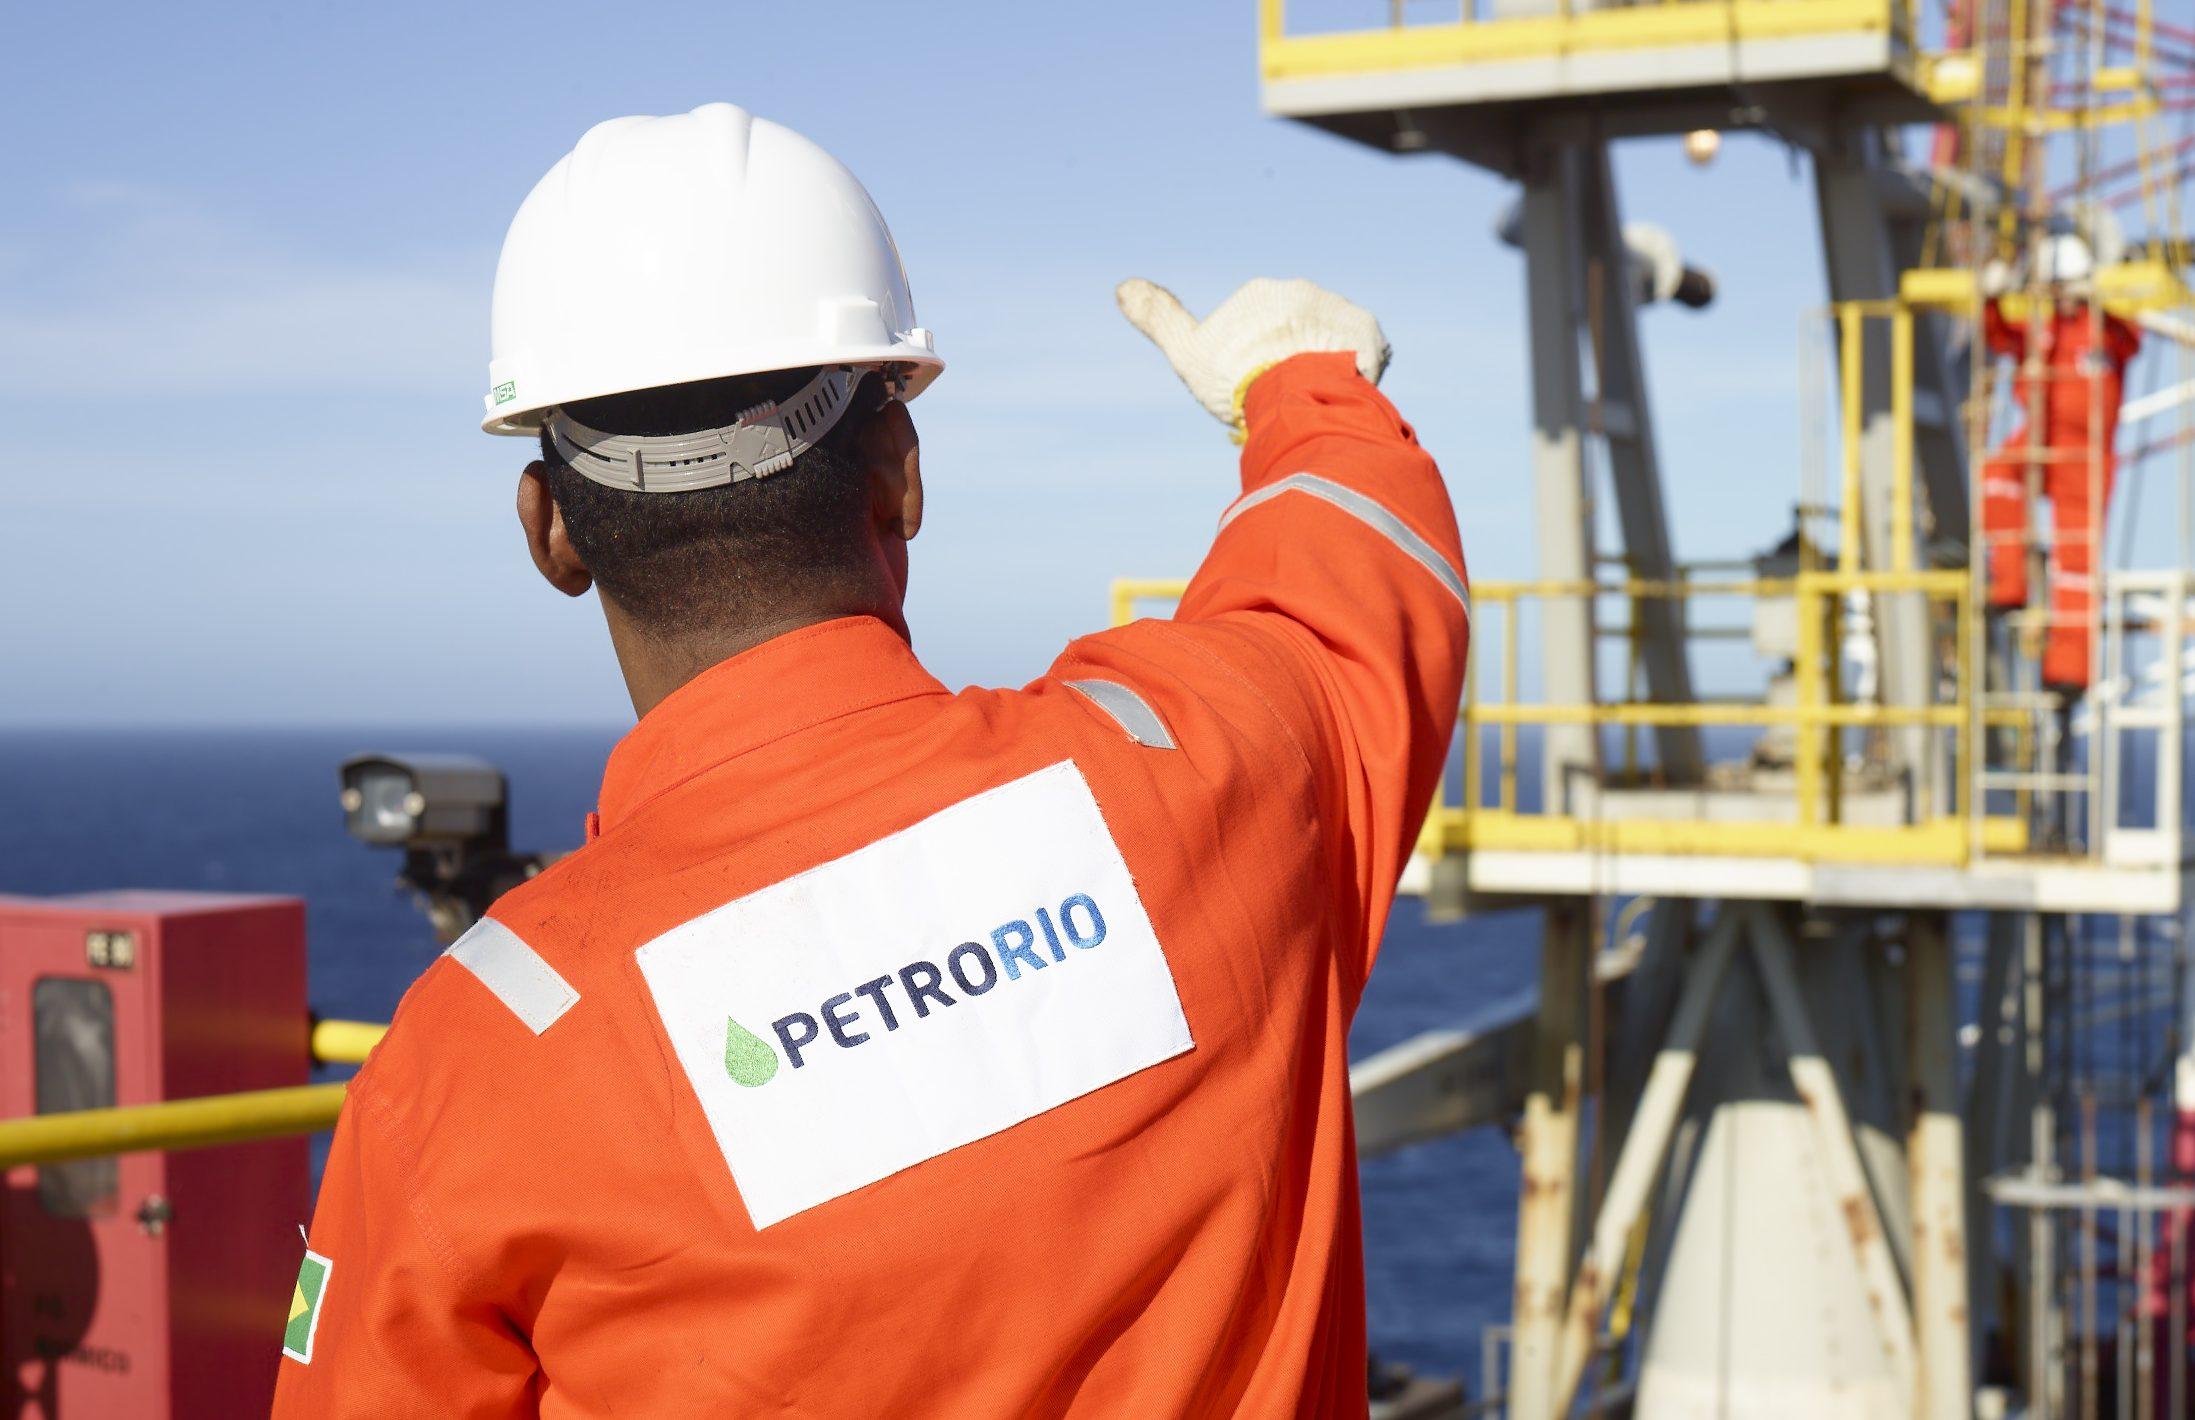 PetroRio